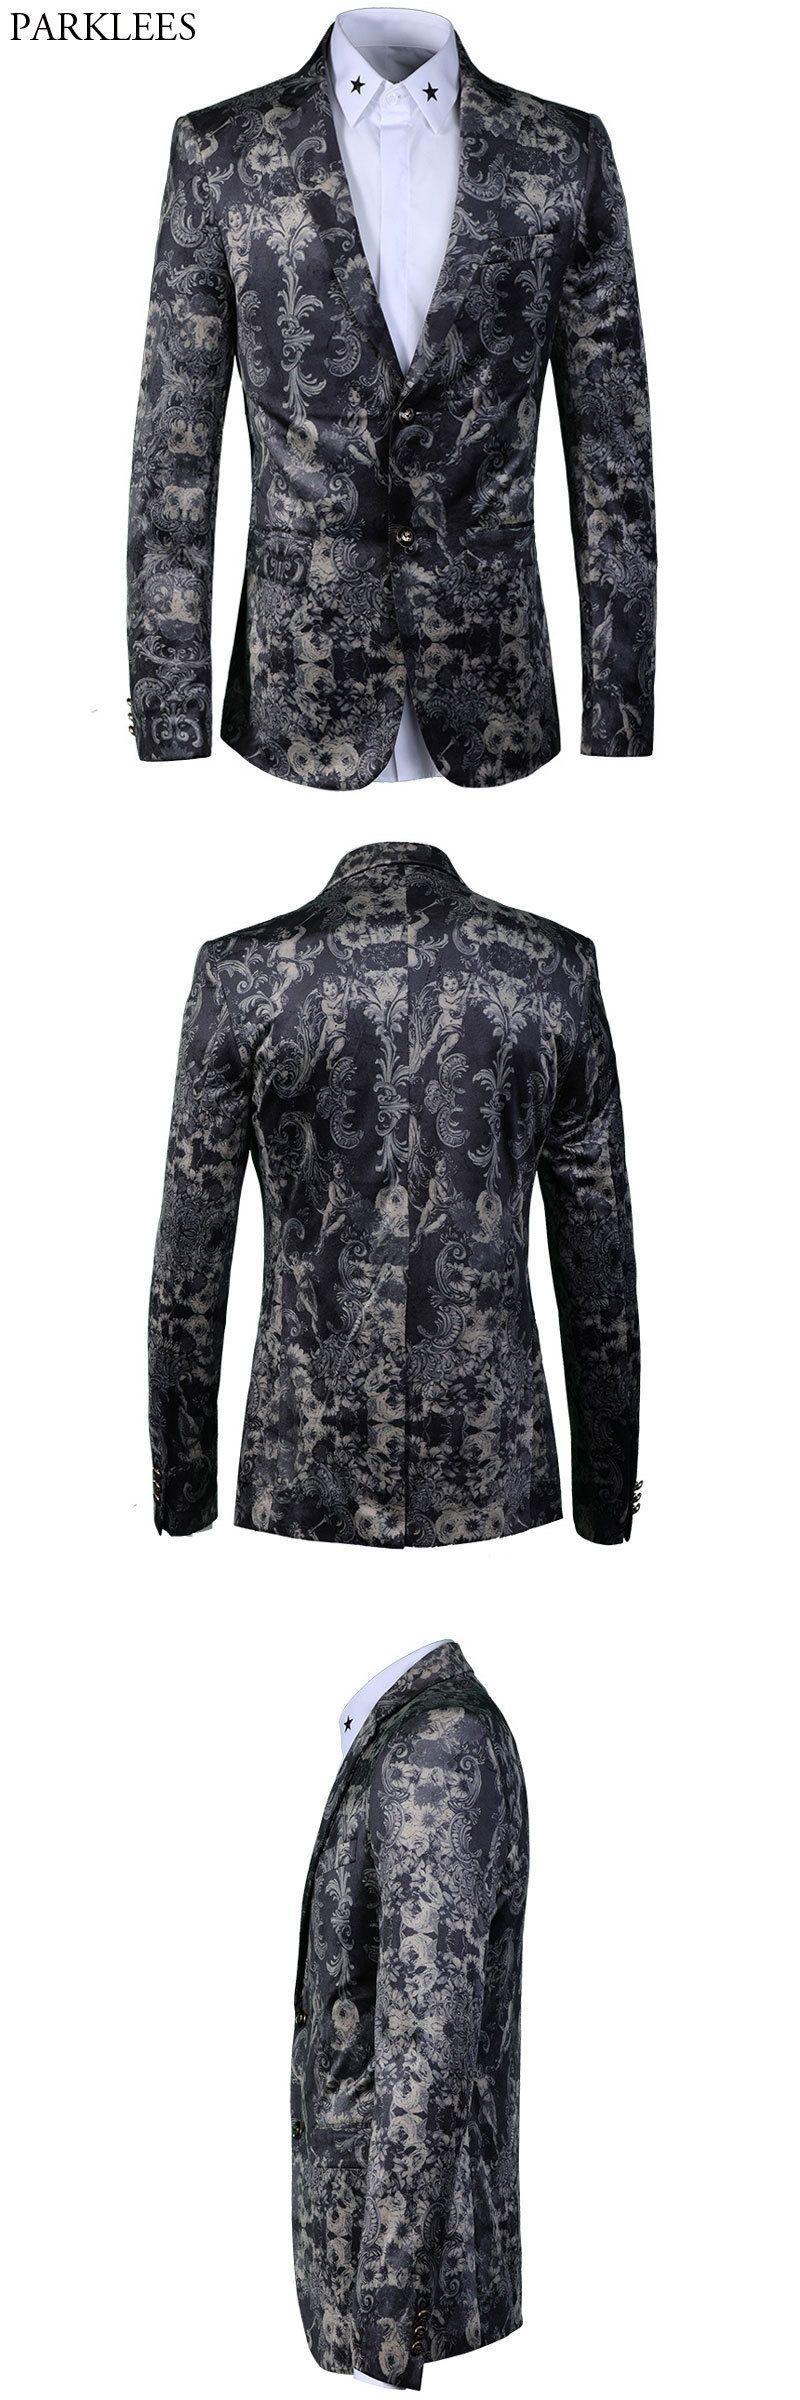 Stylish paisley floral blazer men luxury brand vintage mens